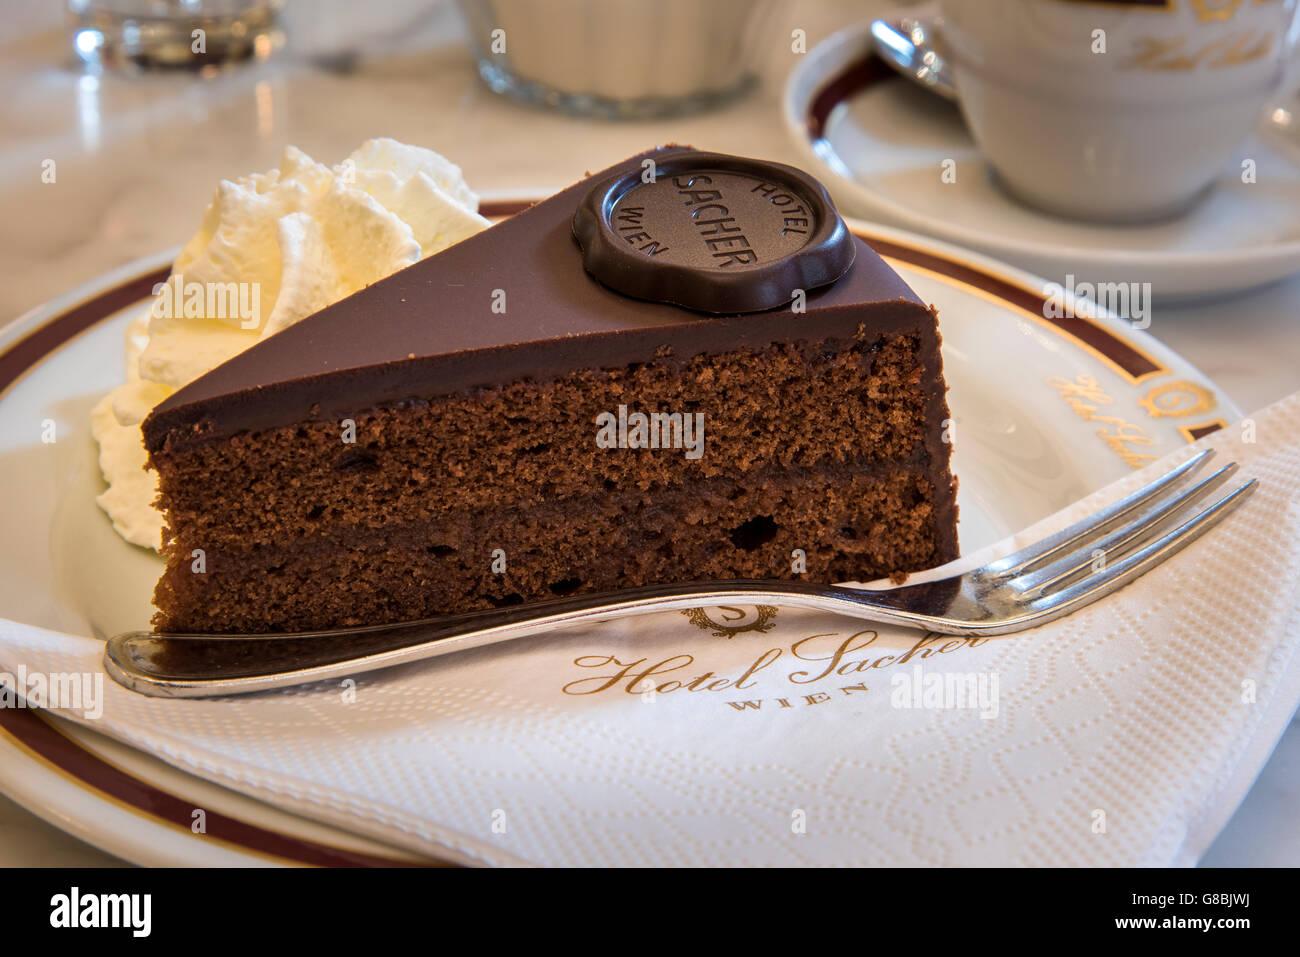 The original Sachertorte chocolate cake served at Cafe Sacher, Hotel Sacher, Vienna, Austria - Stock Image